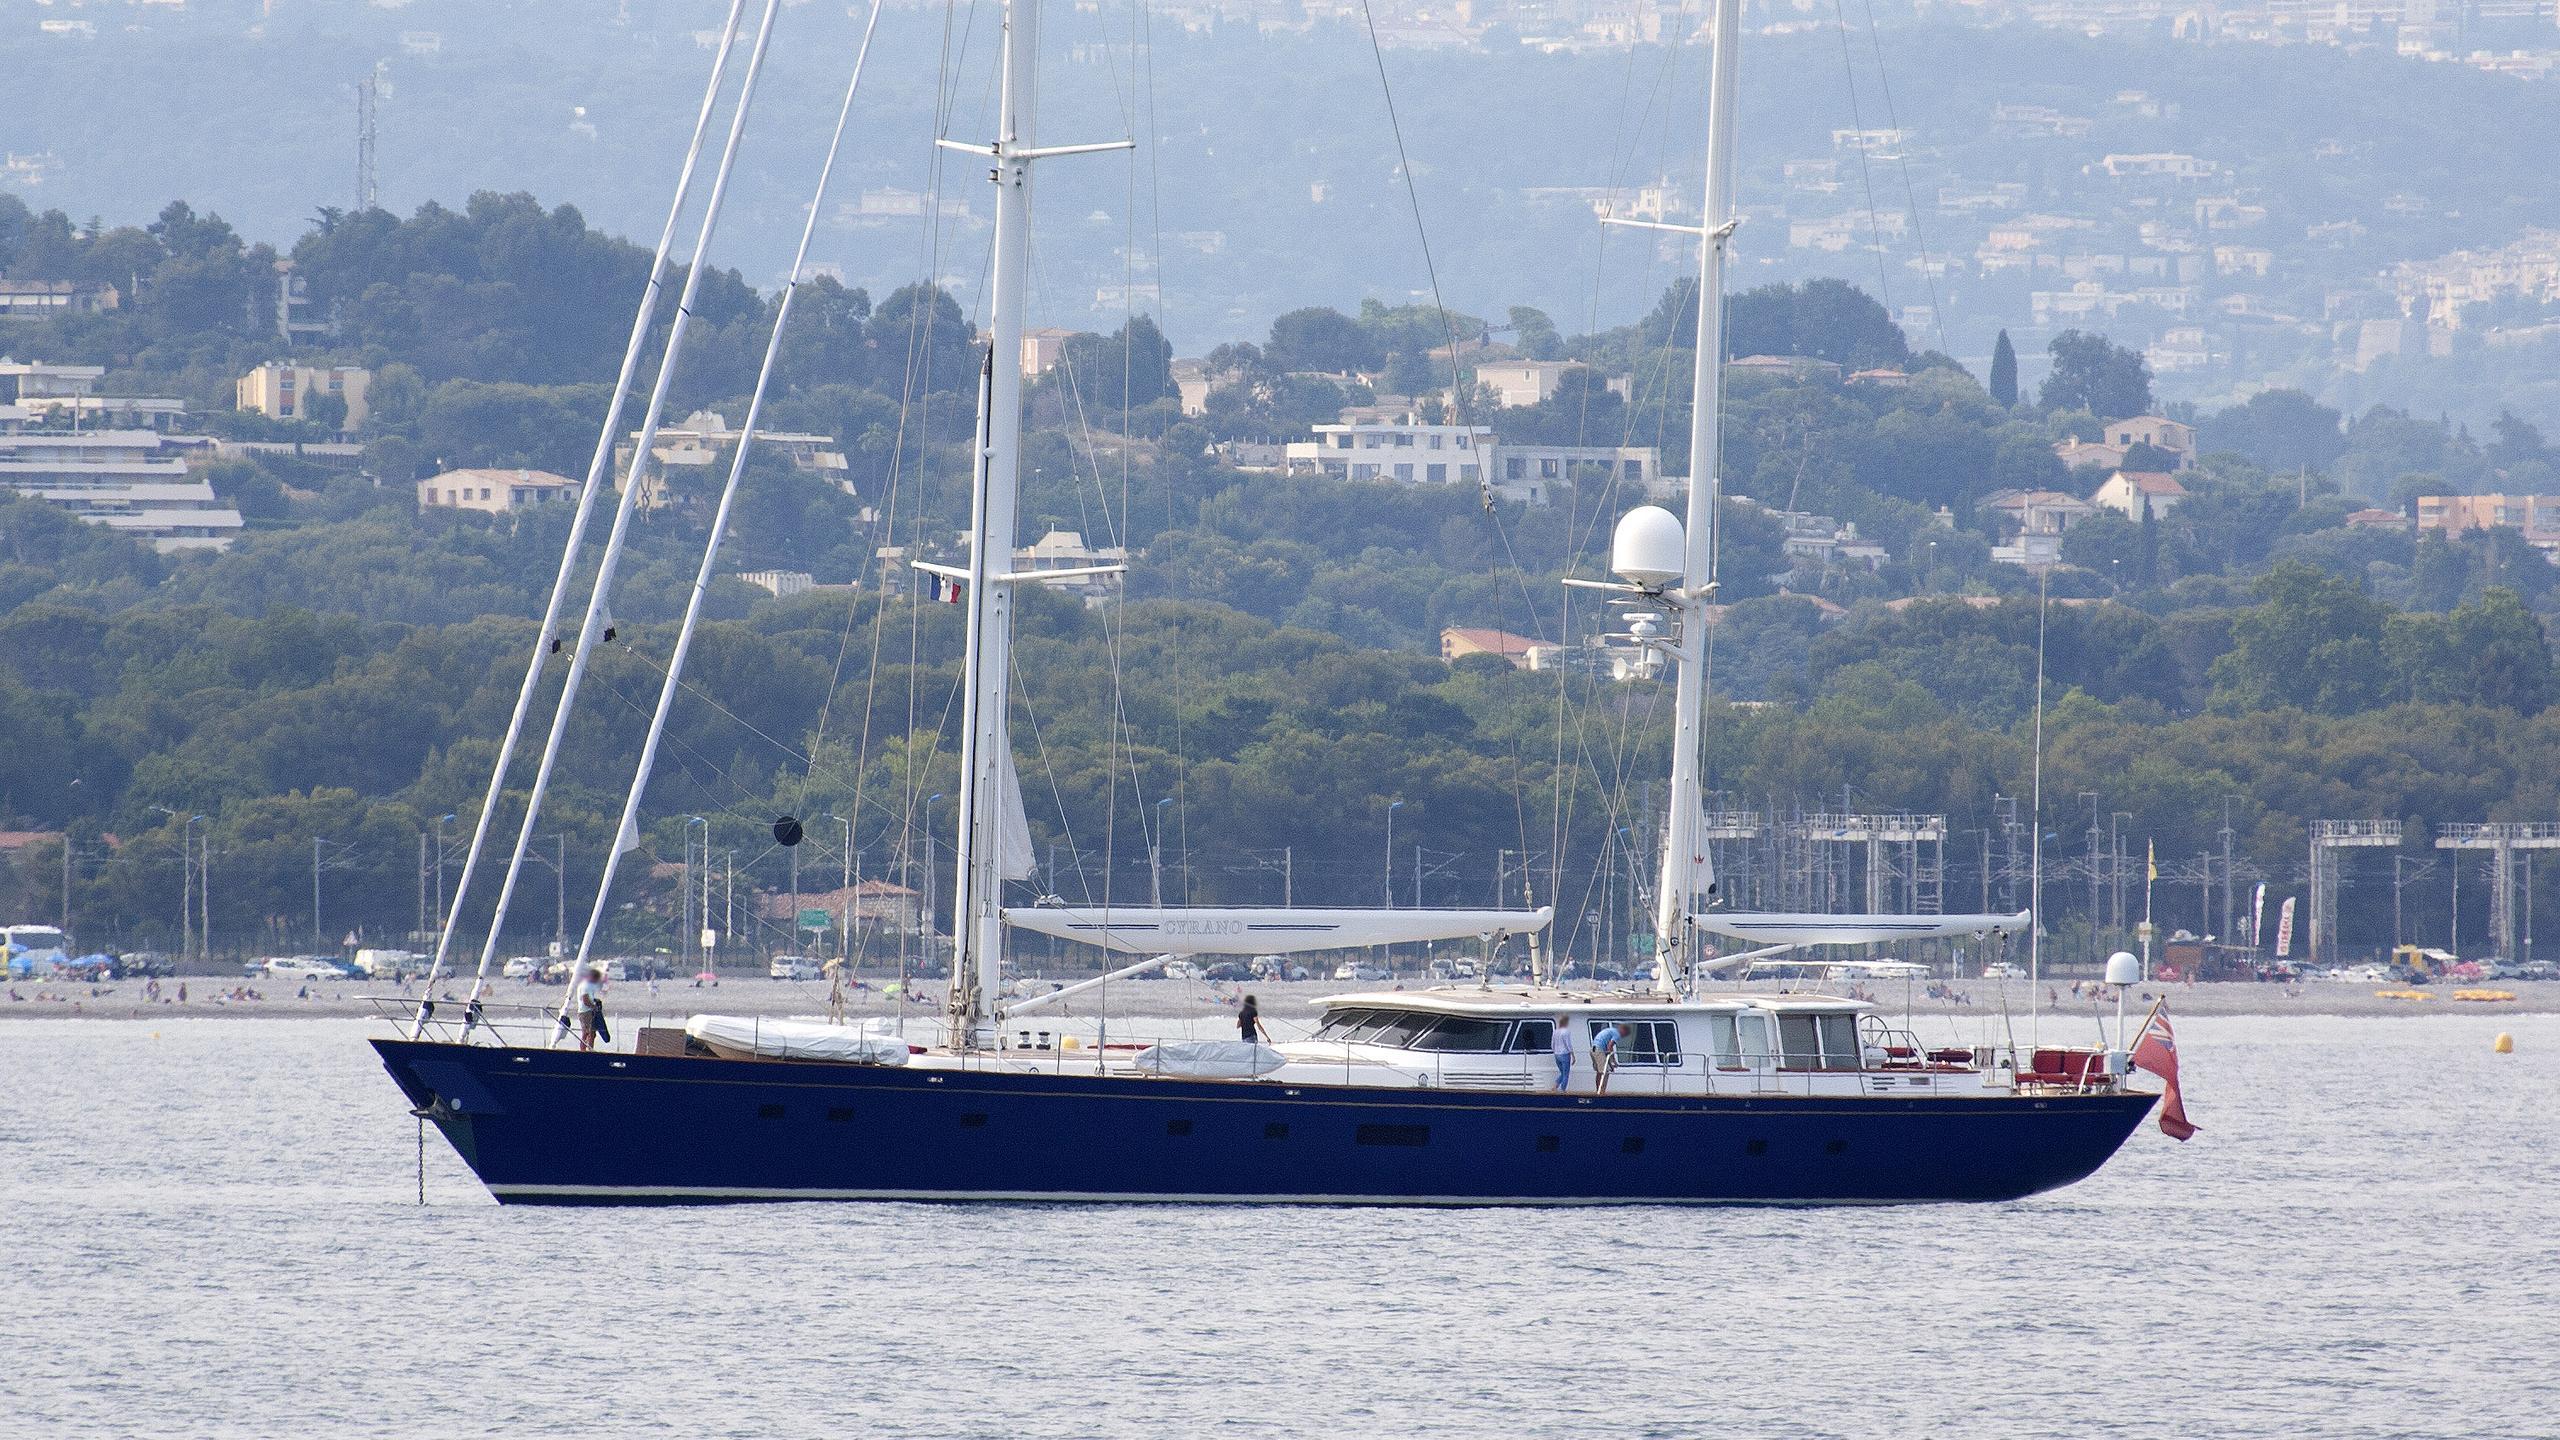 cyrano-de-bergerac-sailing-yacht-camper-nicholsons-1993-39m-profile